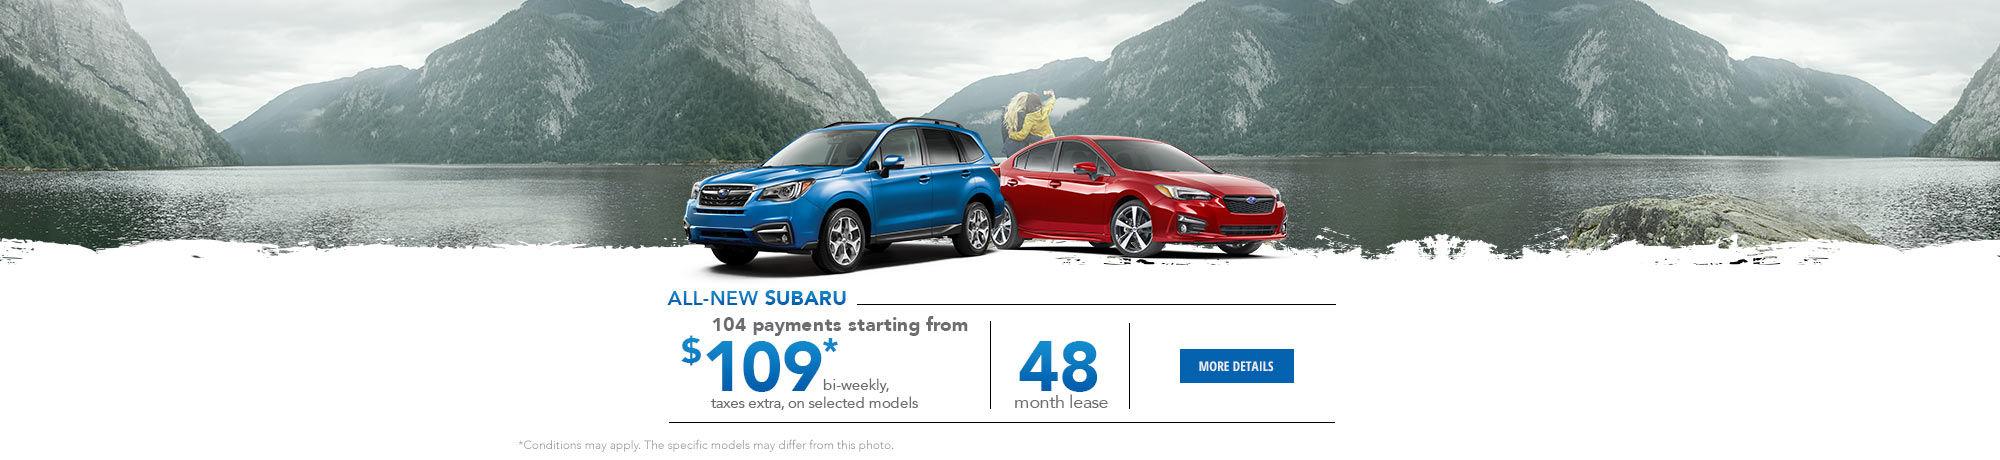 All-New Subaru - October